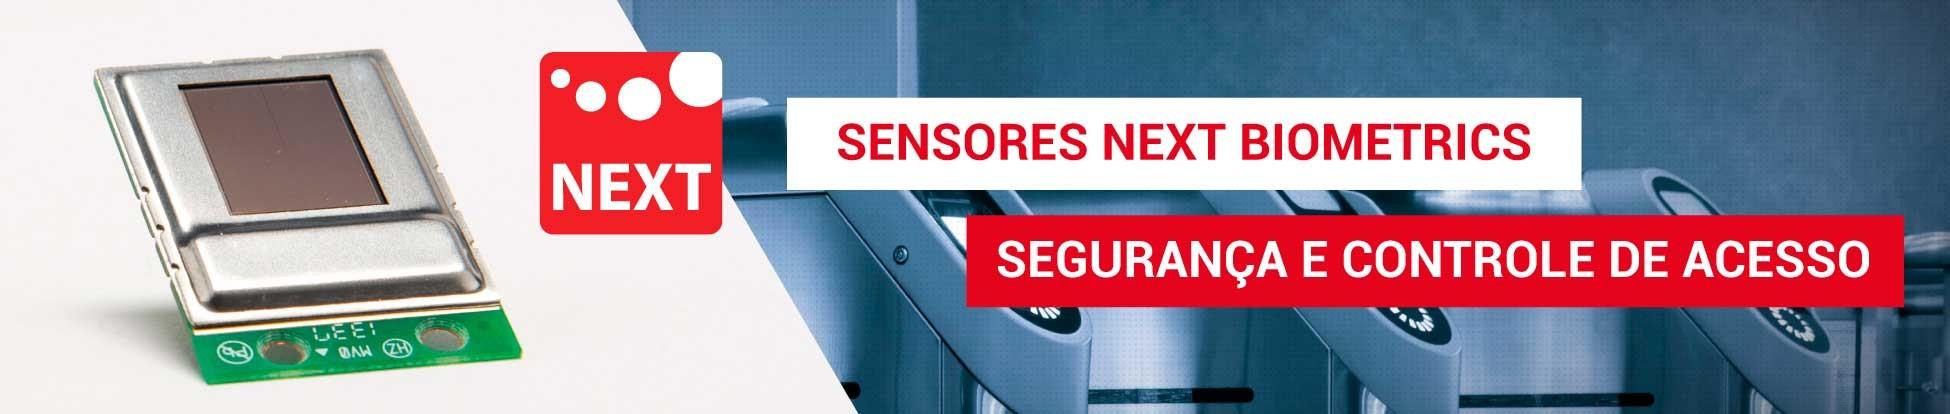 Destaque Next Biometrics